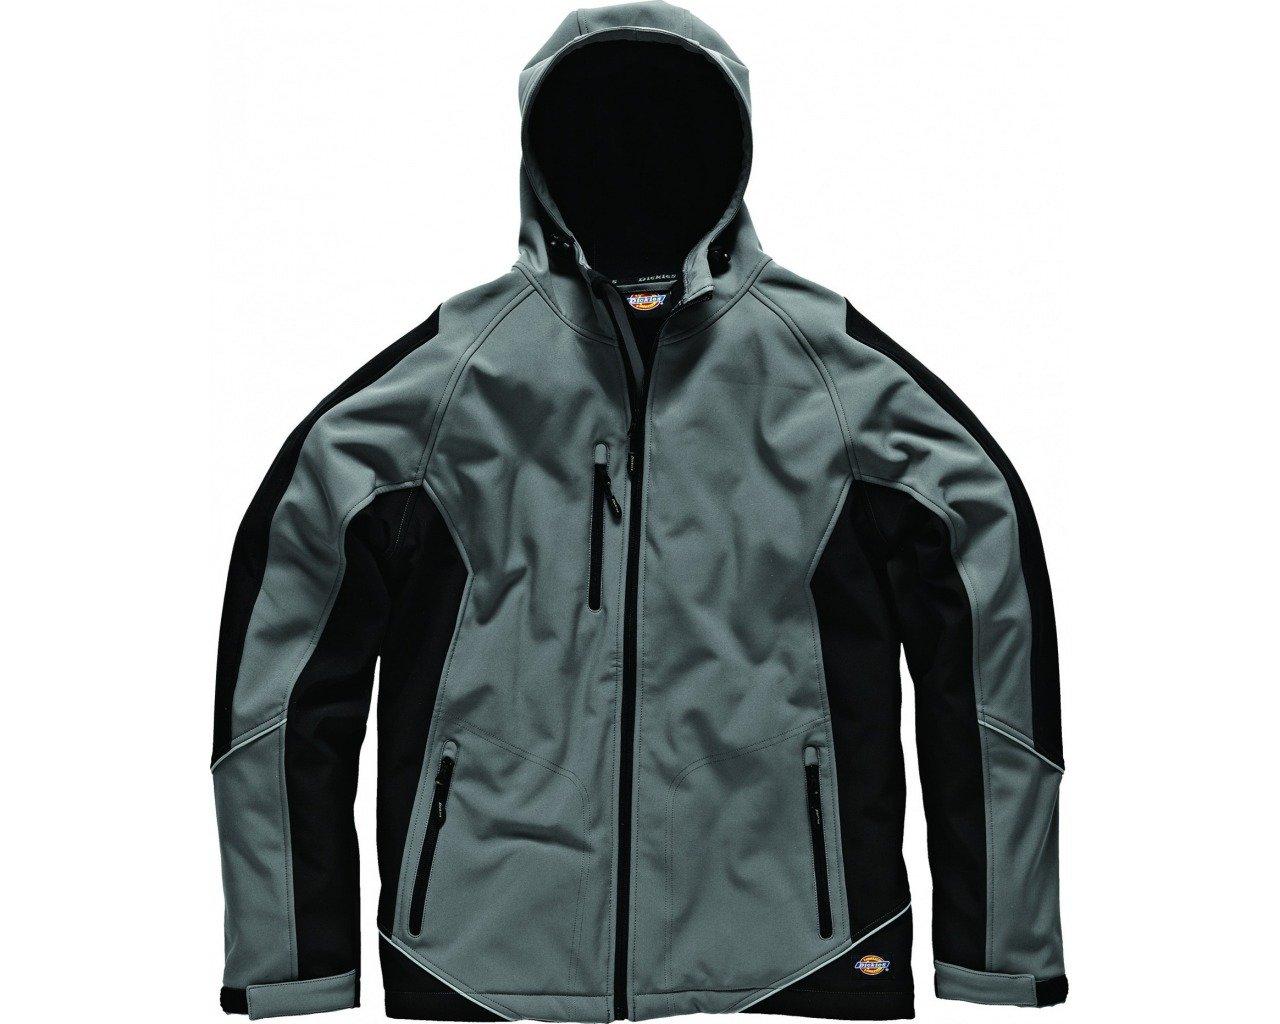 Dickies Two Tone Micro Fleece Navy /& Black Sizes S-XXXL